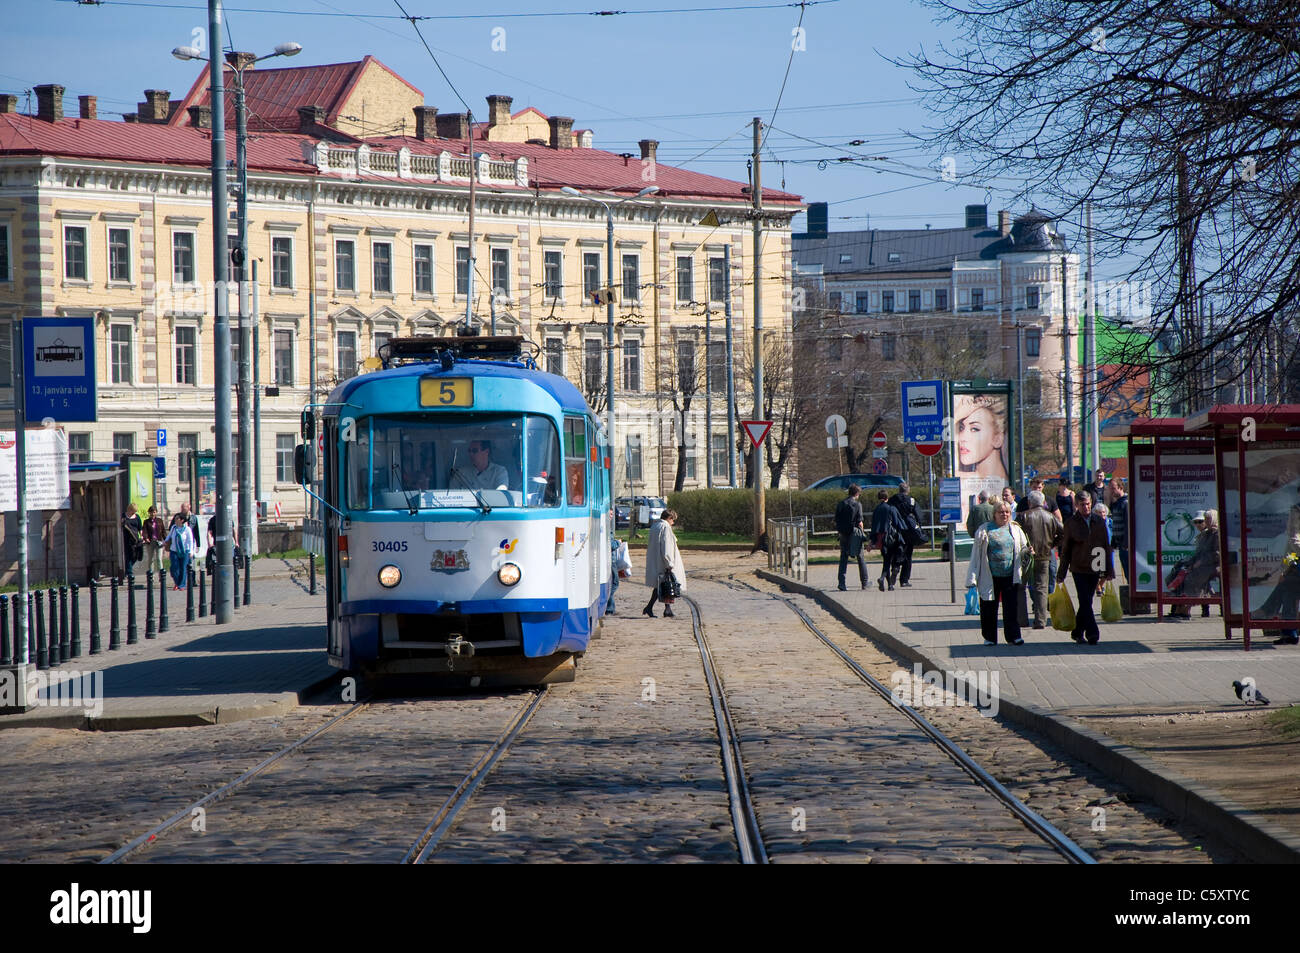 Tram, Riga, Latvia - Stock Image